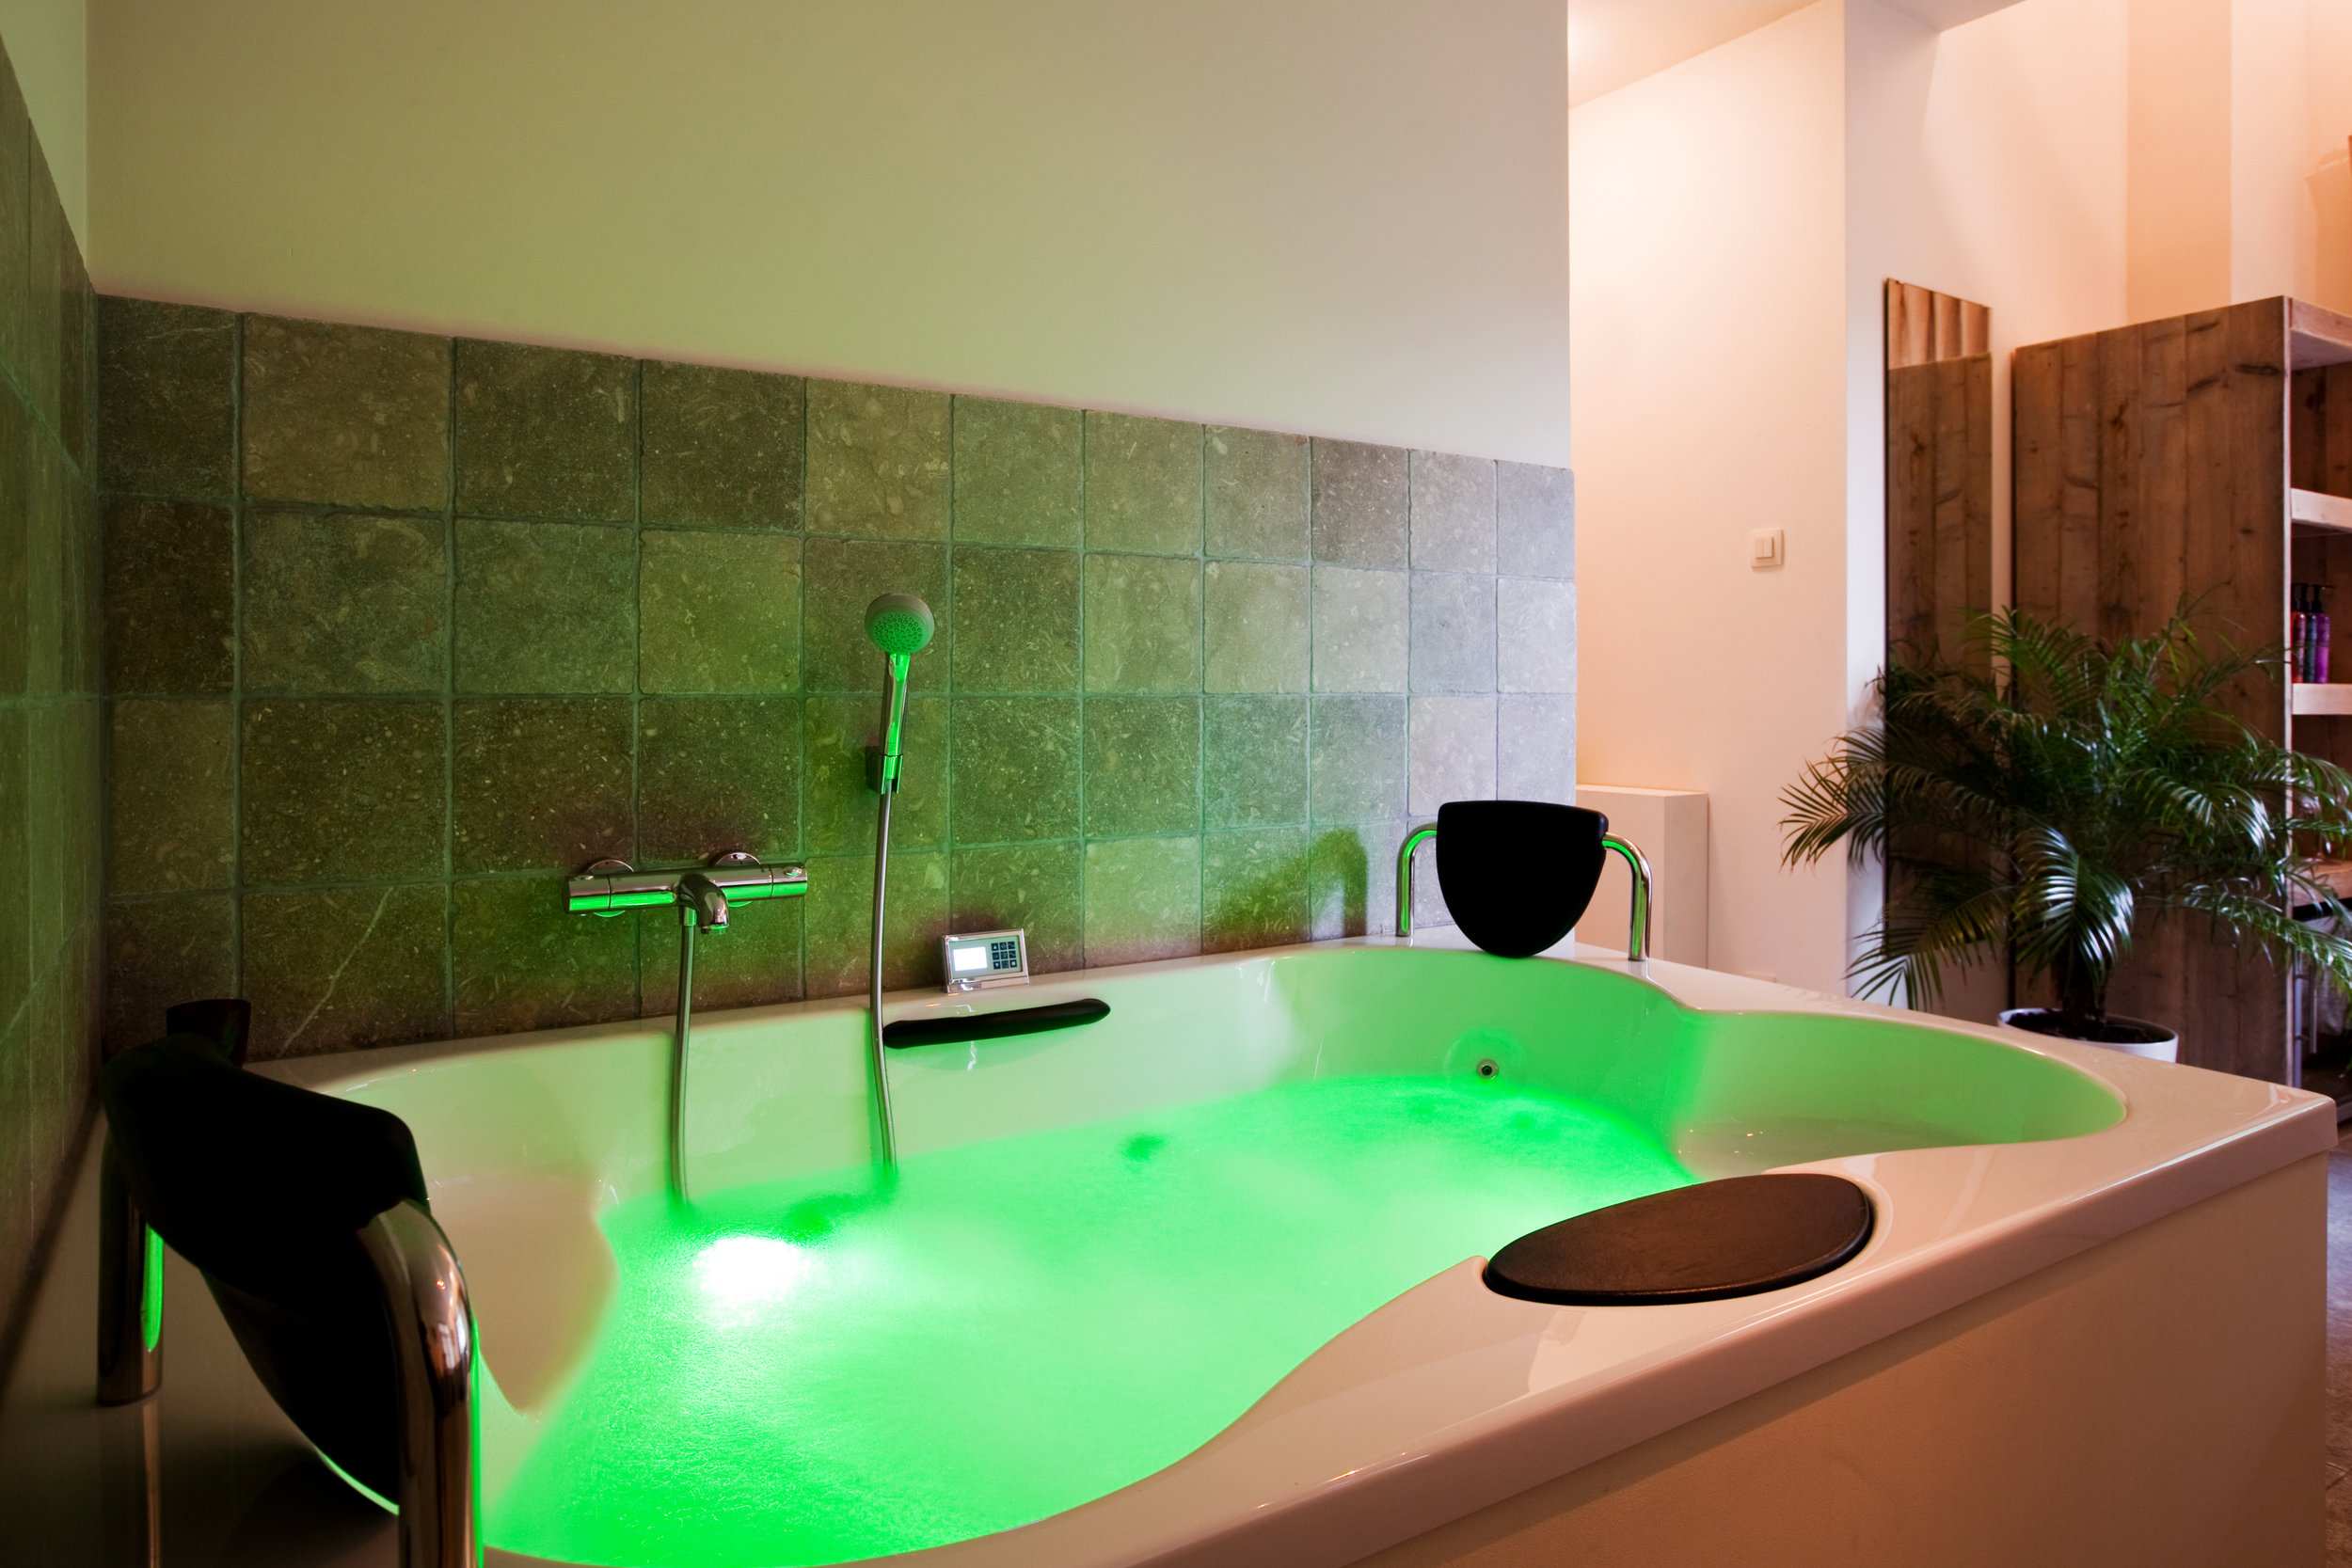 massagebad groen.jpg